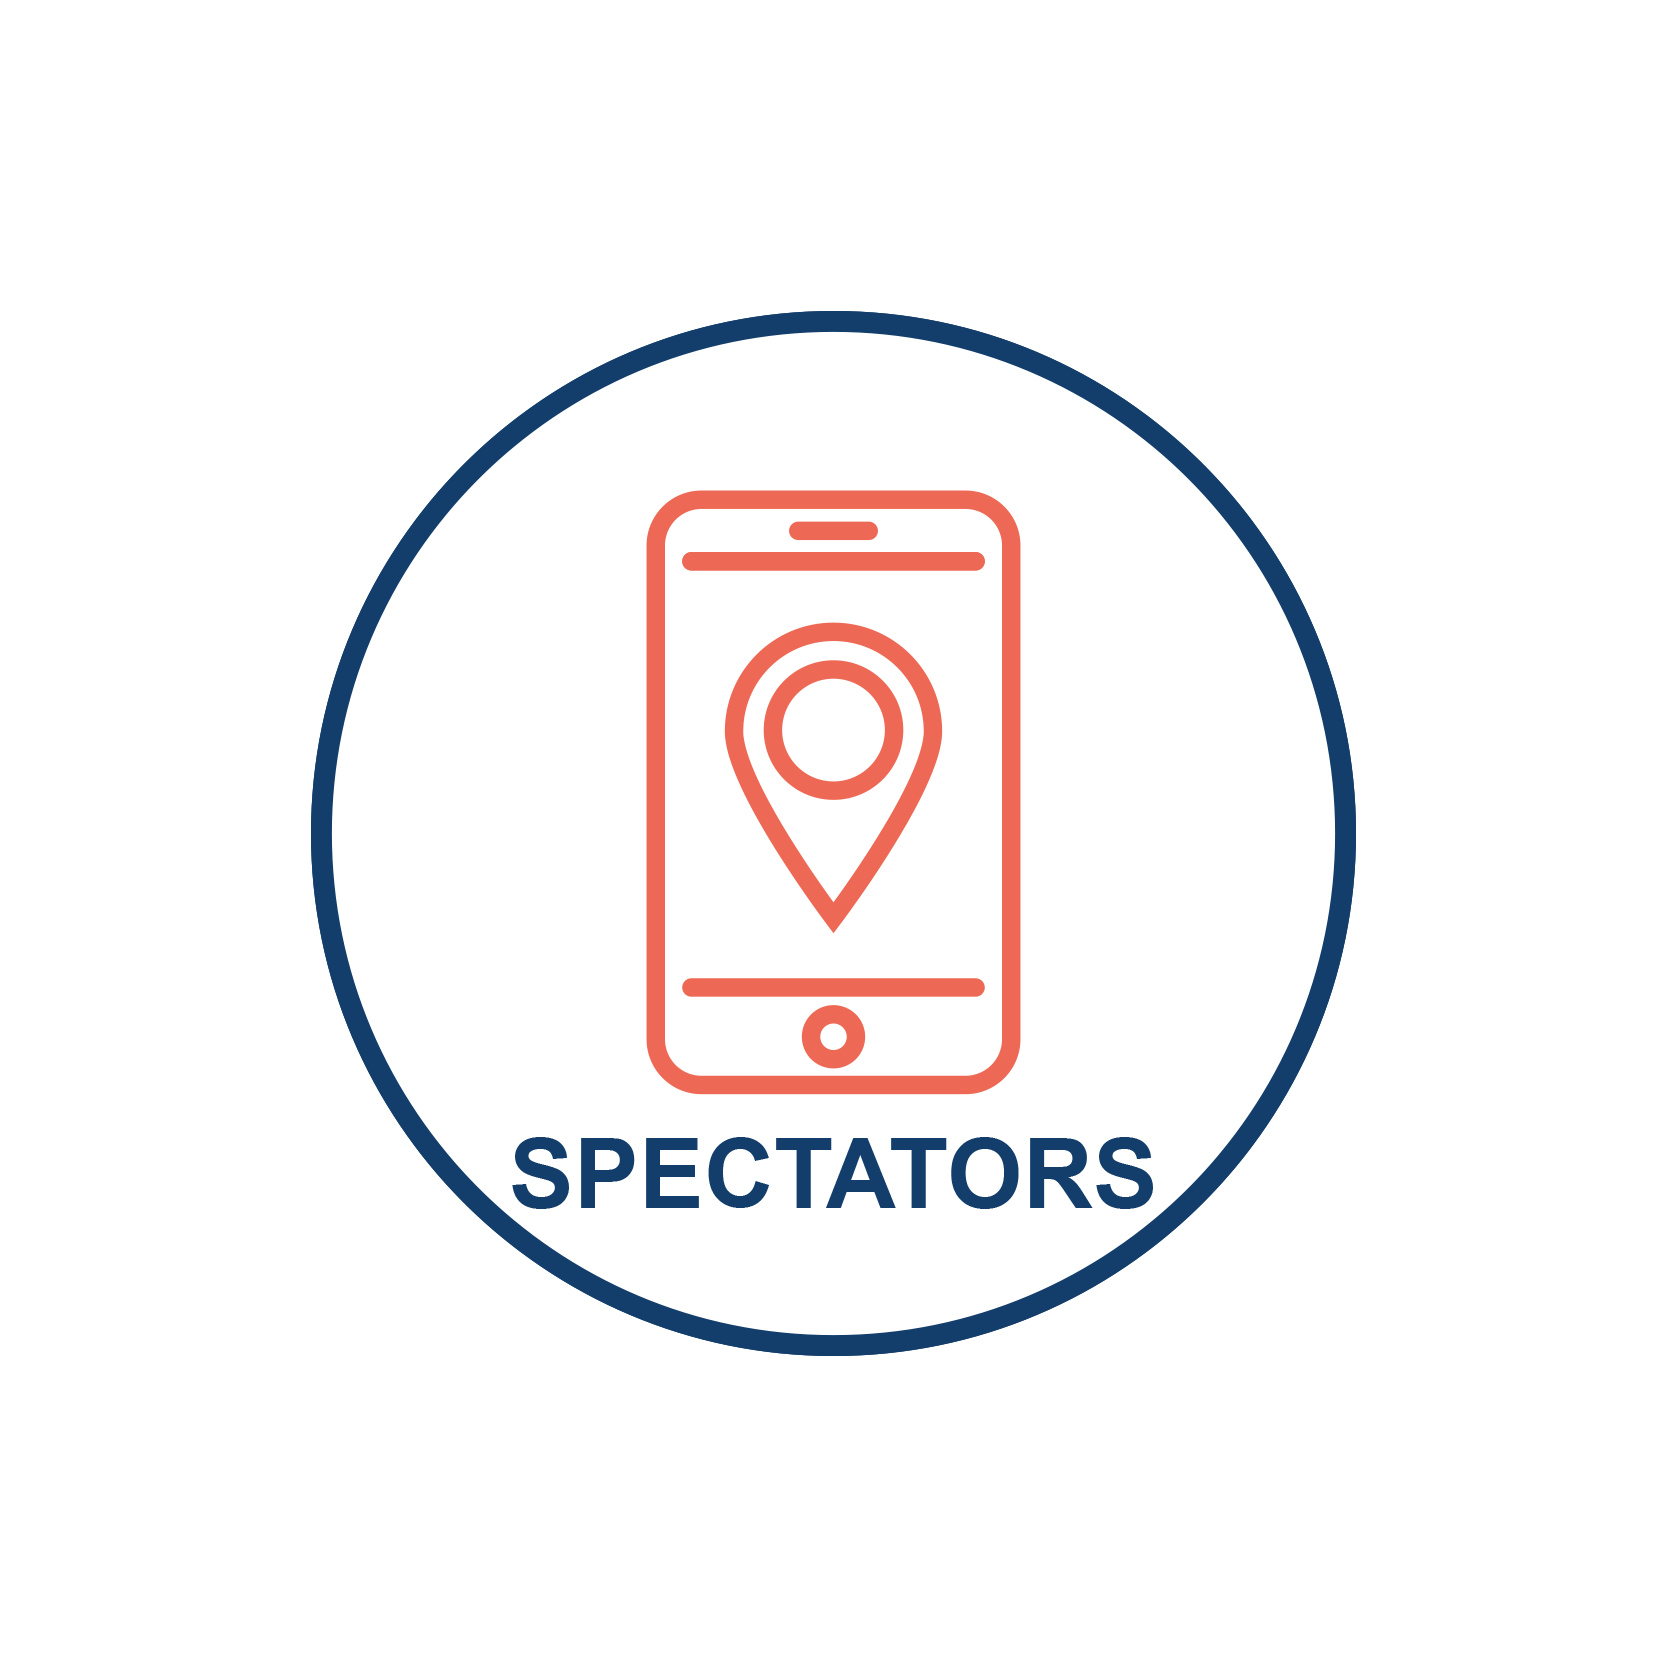 spectators-icon.png